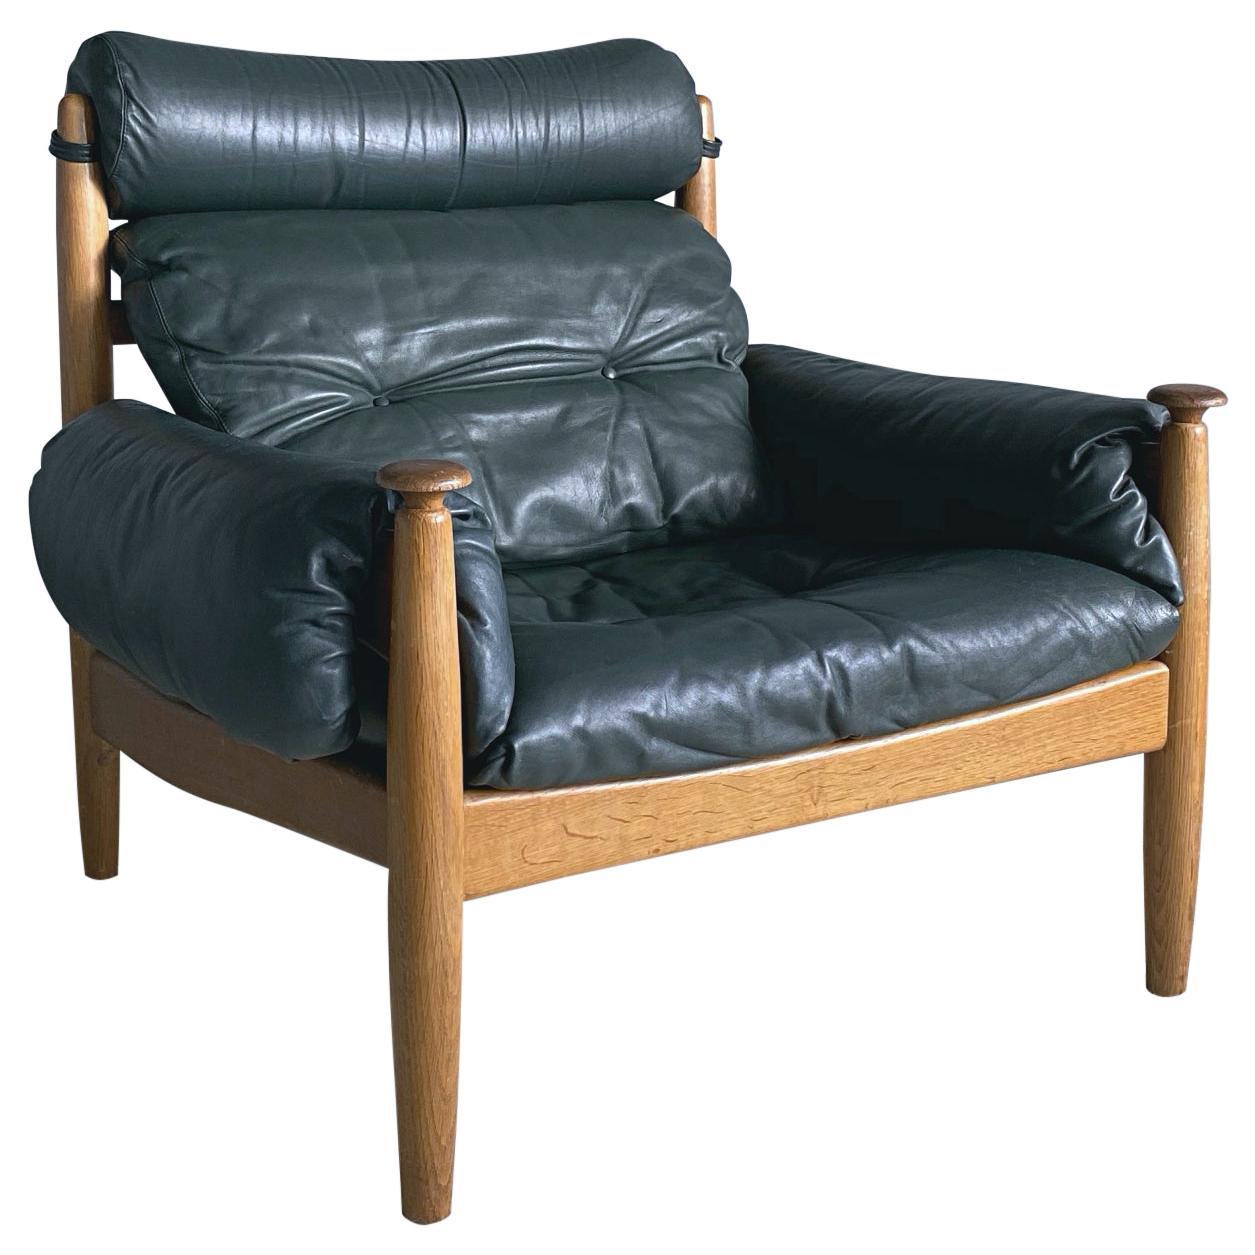 IRE Möbler Eric Merthen Midcentury Green Leather Lounge Chair, 1960s, Sweden